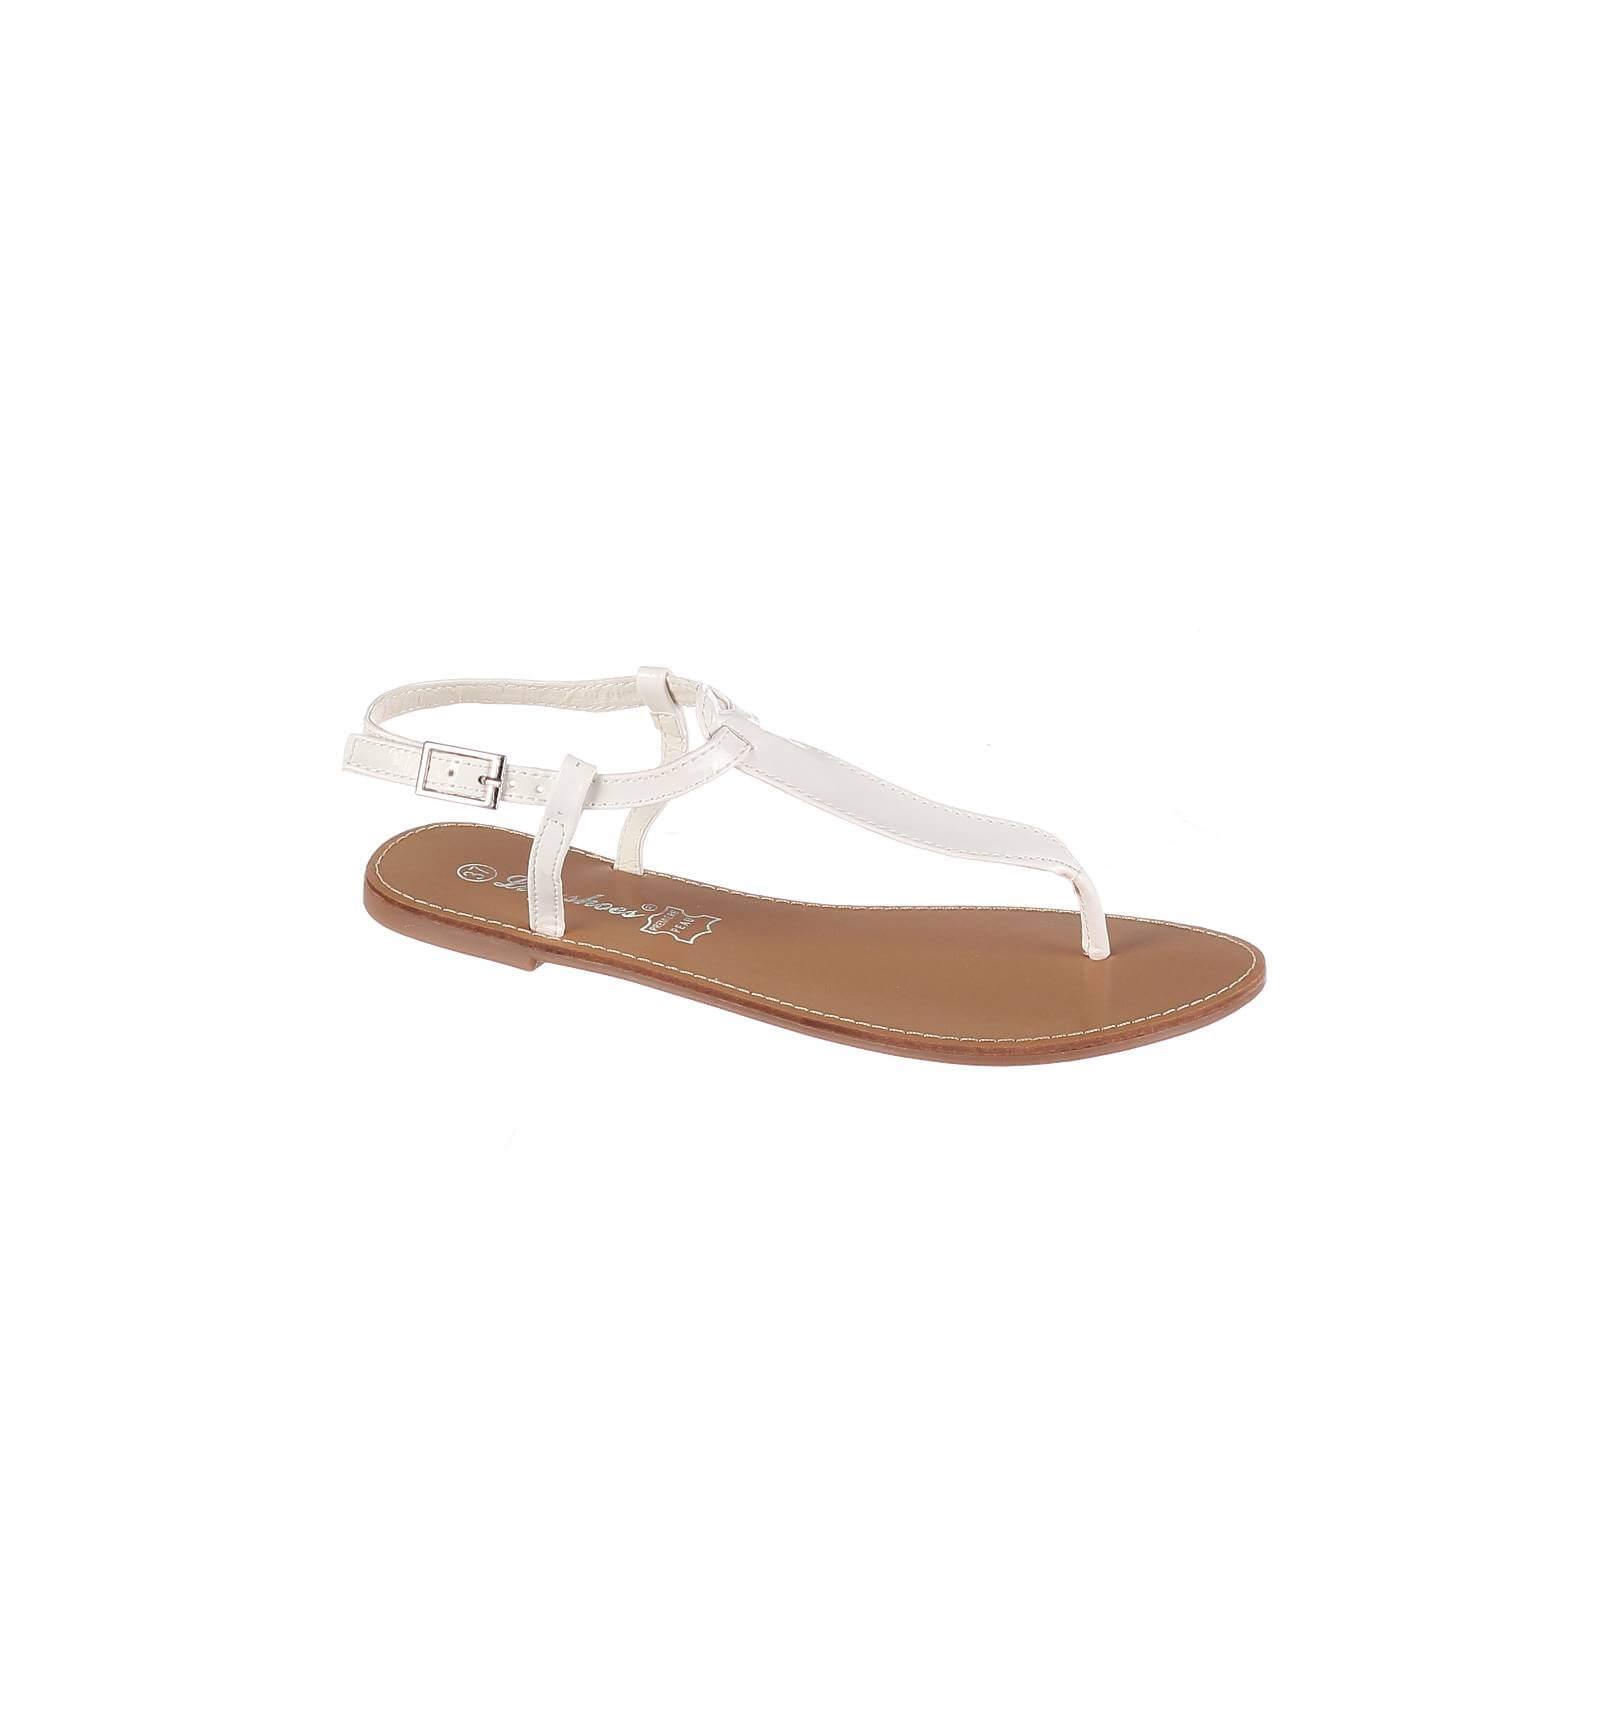 sandales femme plates blanc vernies mod le ibiza chic et glamour. Black Bedroom Furniture Sets. Home Design Ideas